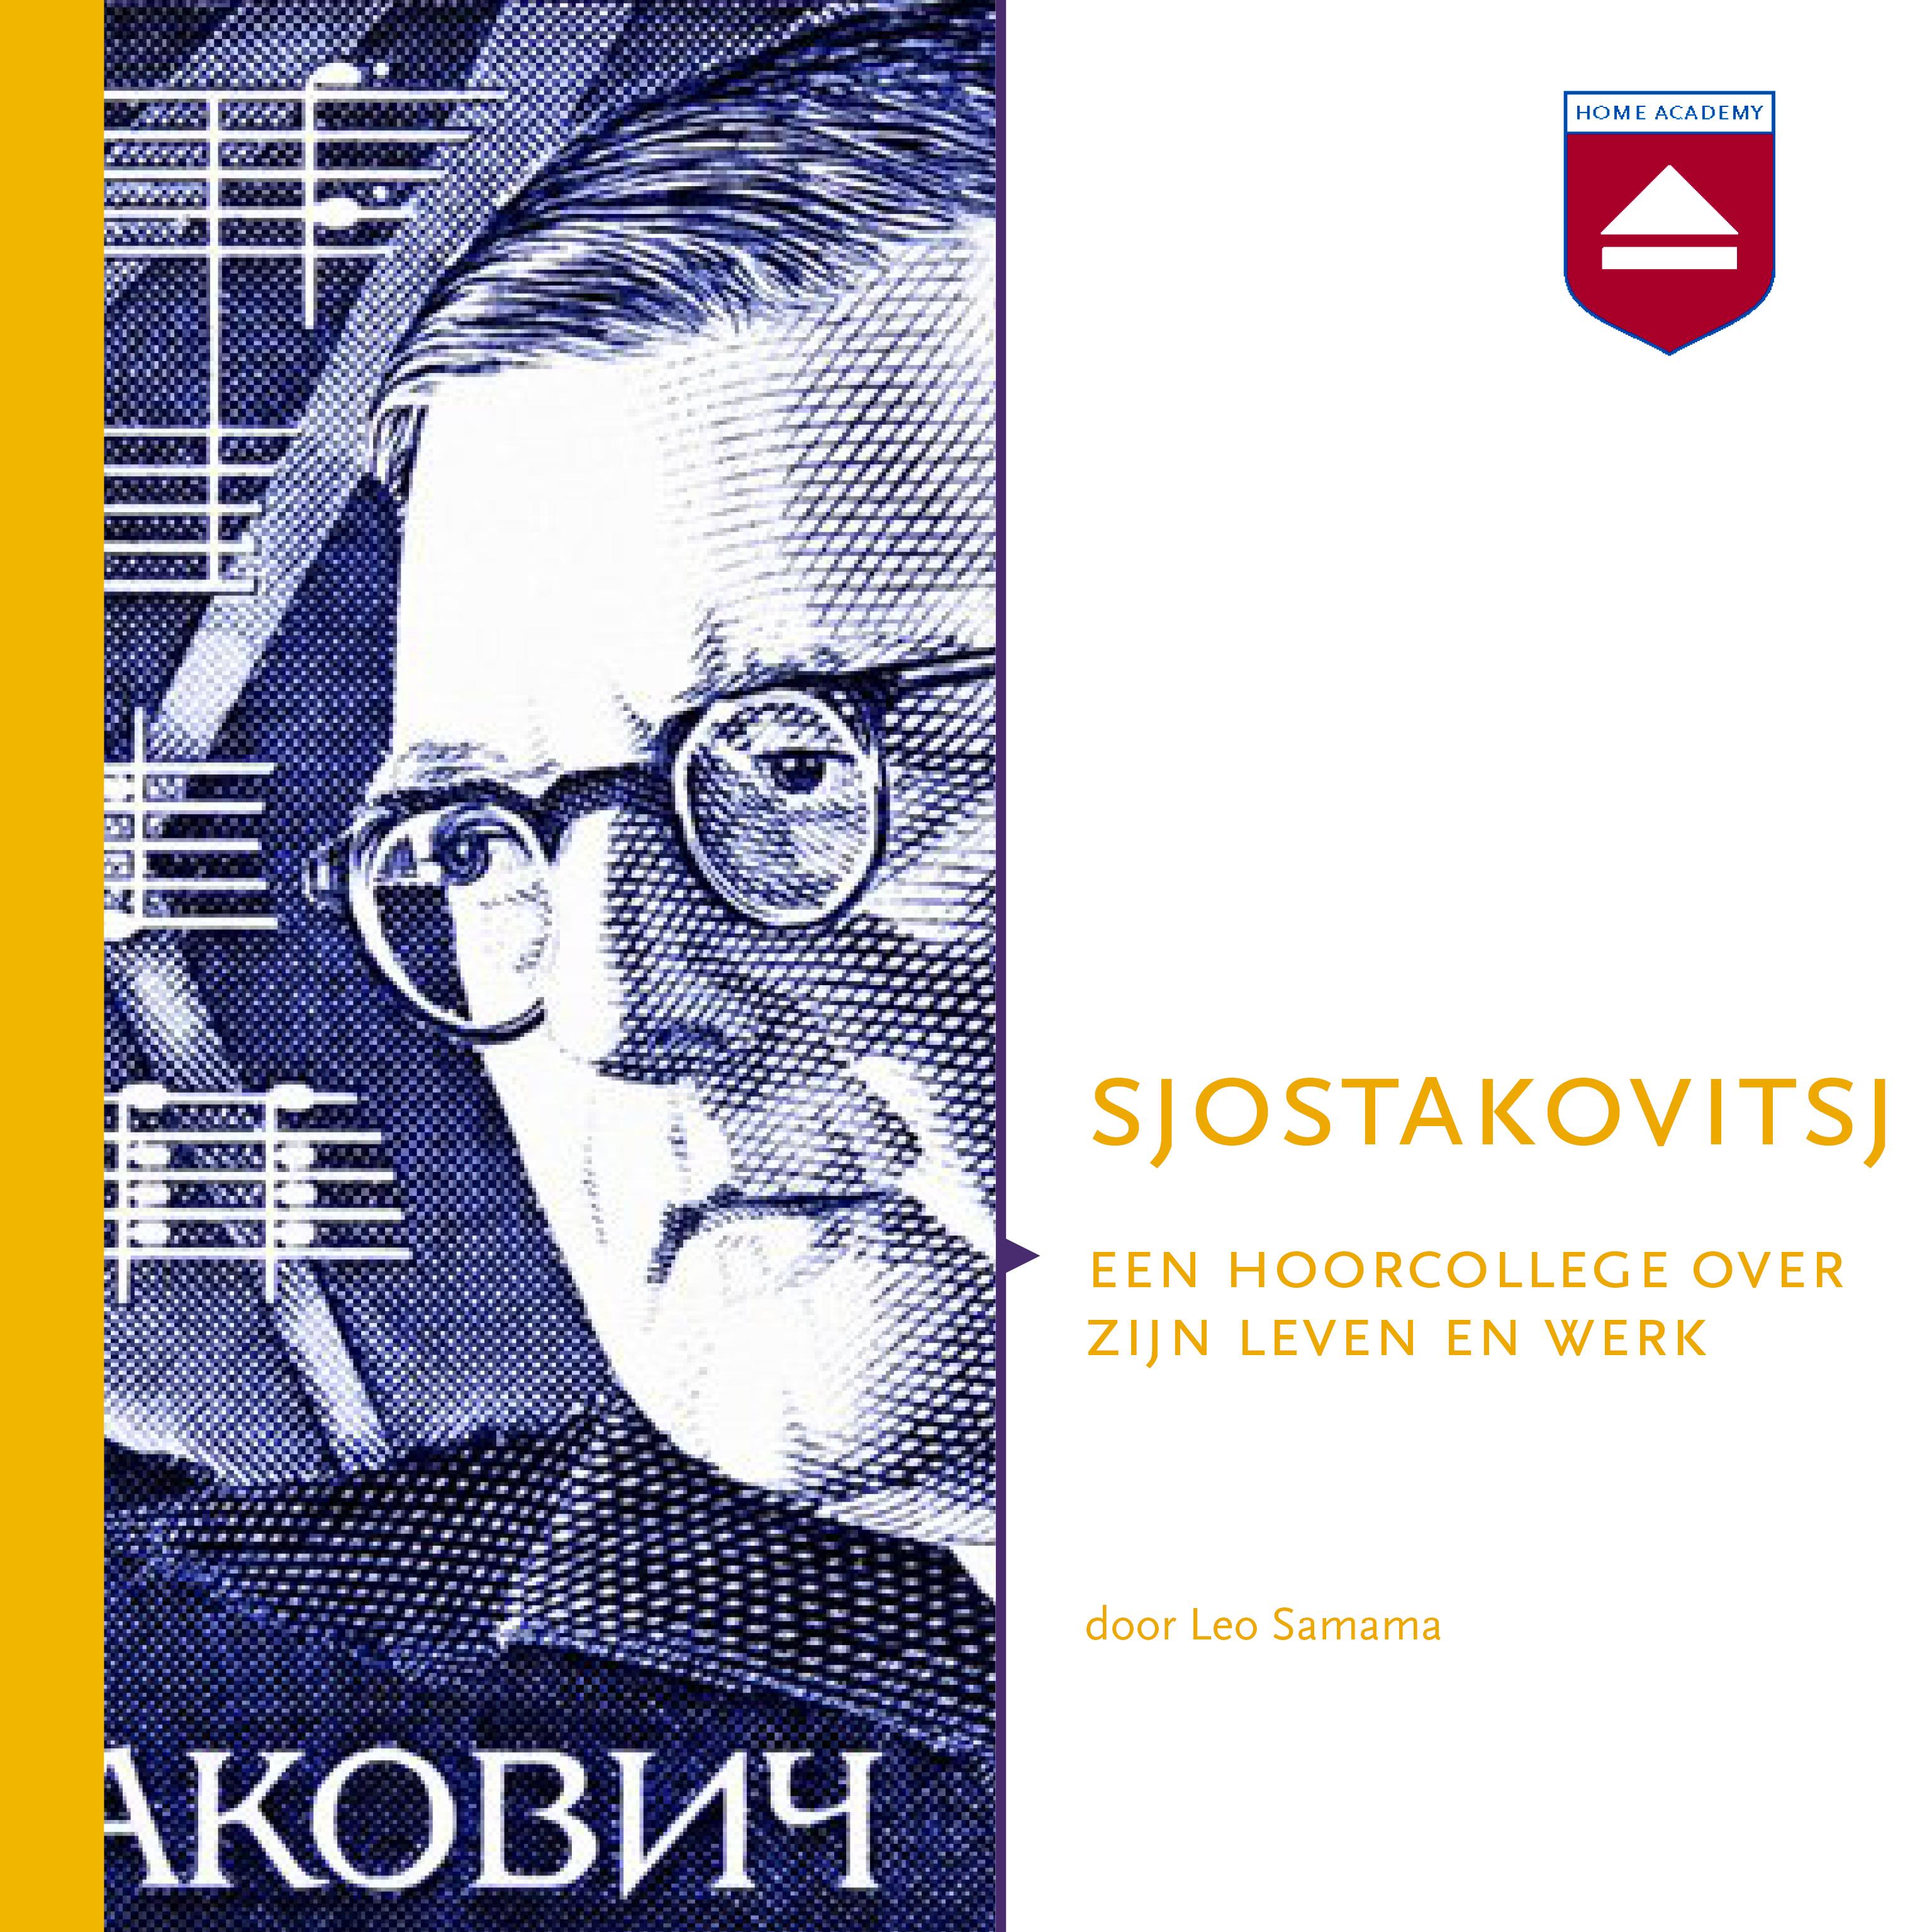 Sjostakovitsj - hoorcolleges Home Academy